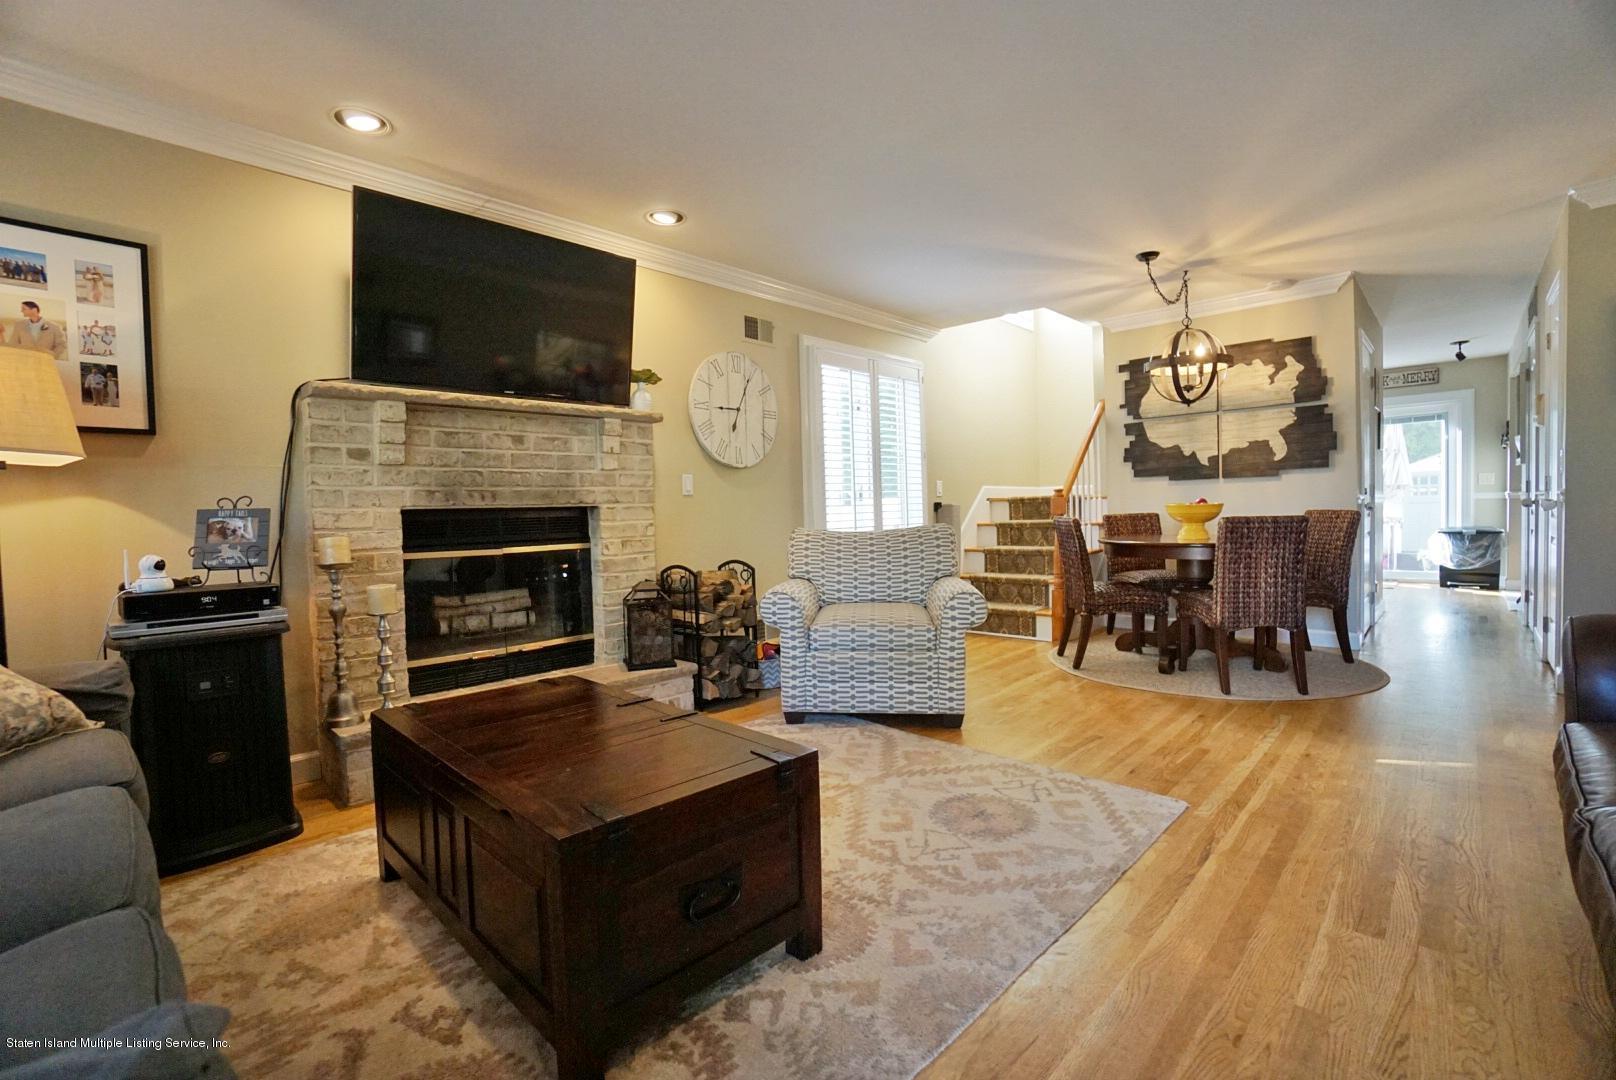 Single Family - Semi-Attached 66 Reading Avenue  Staten Island, NY 10312, MLS-1132256-3